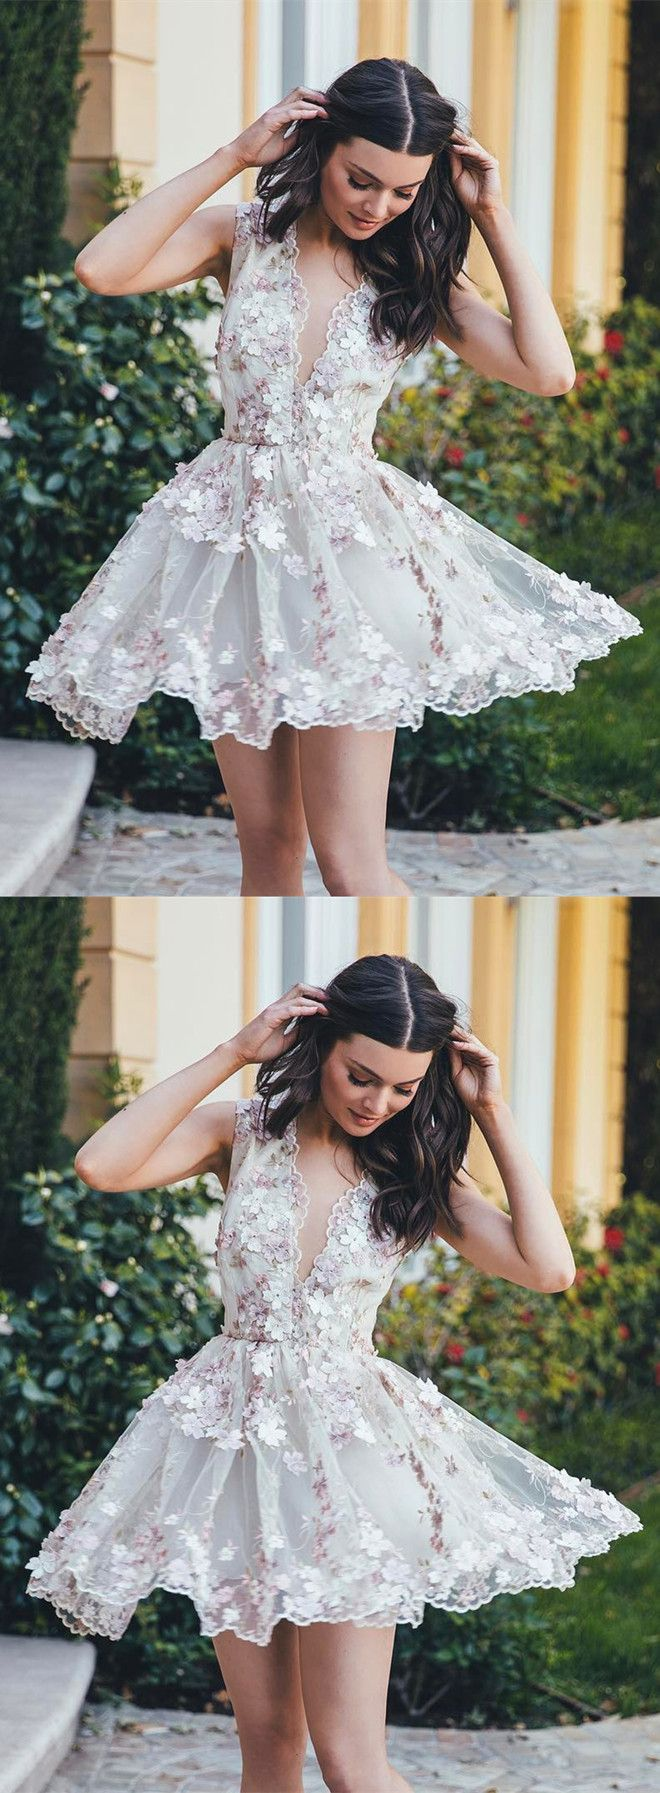 short homecoming dresses,unique homecoming dresses,prom dresses for teens, princess homecoming dresses,2017 homecoming dresses @simpledress2480 http://womenfashionparadise.com/